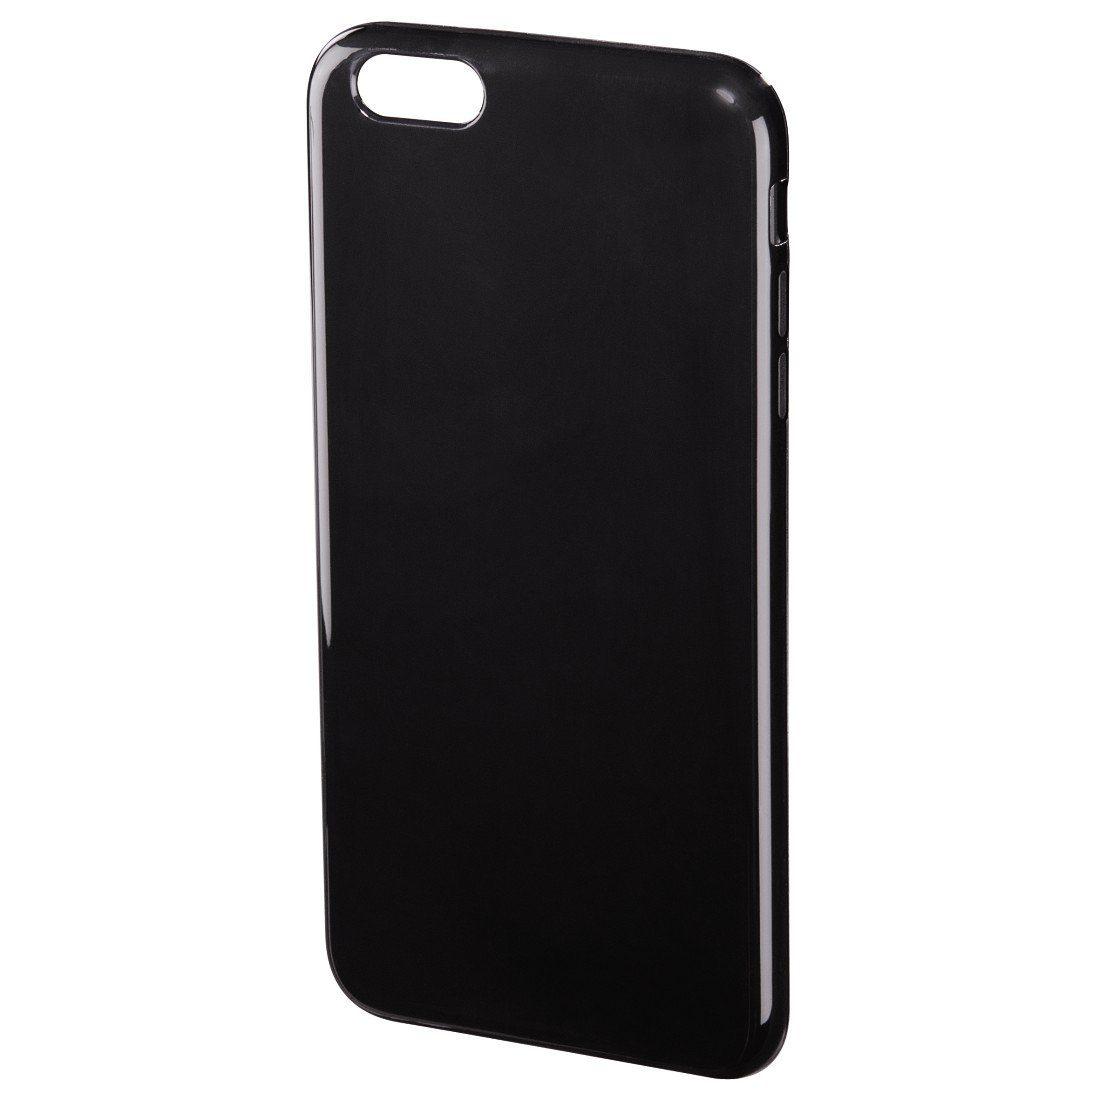 Hama Cover Crystal für Apple iPhone 6 Plus/6s Plus, Schwarz